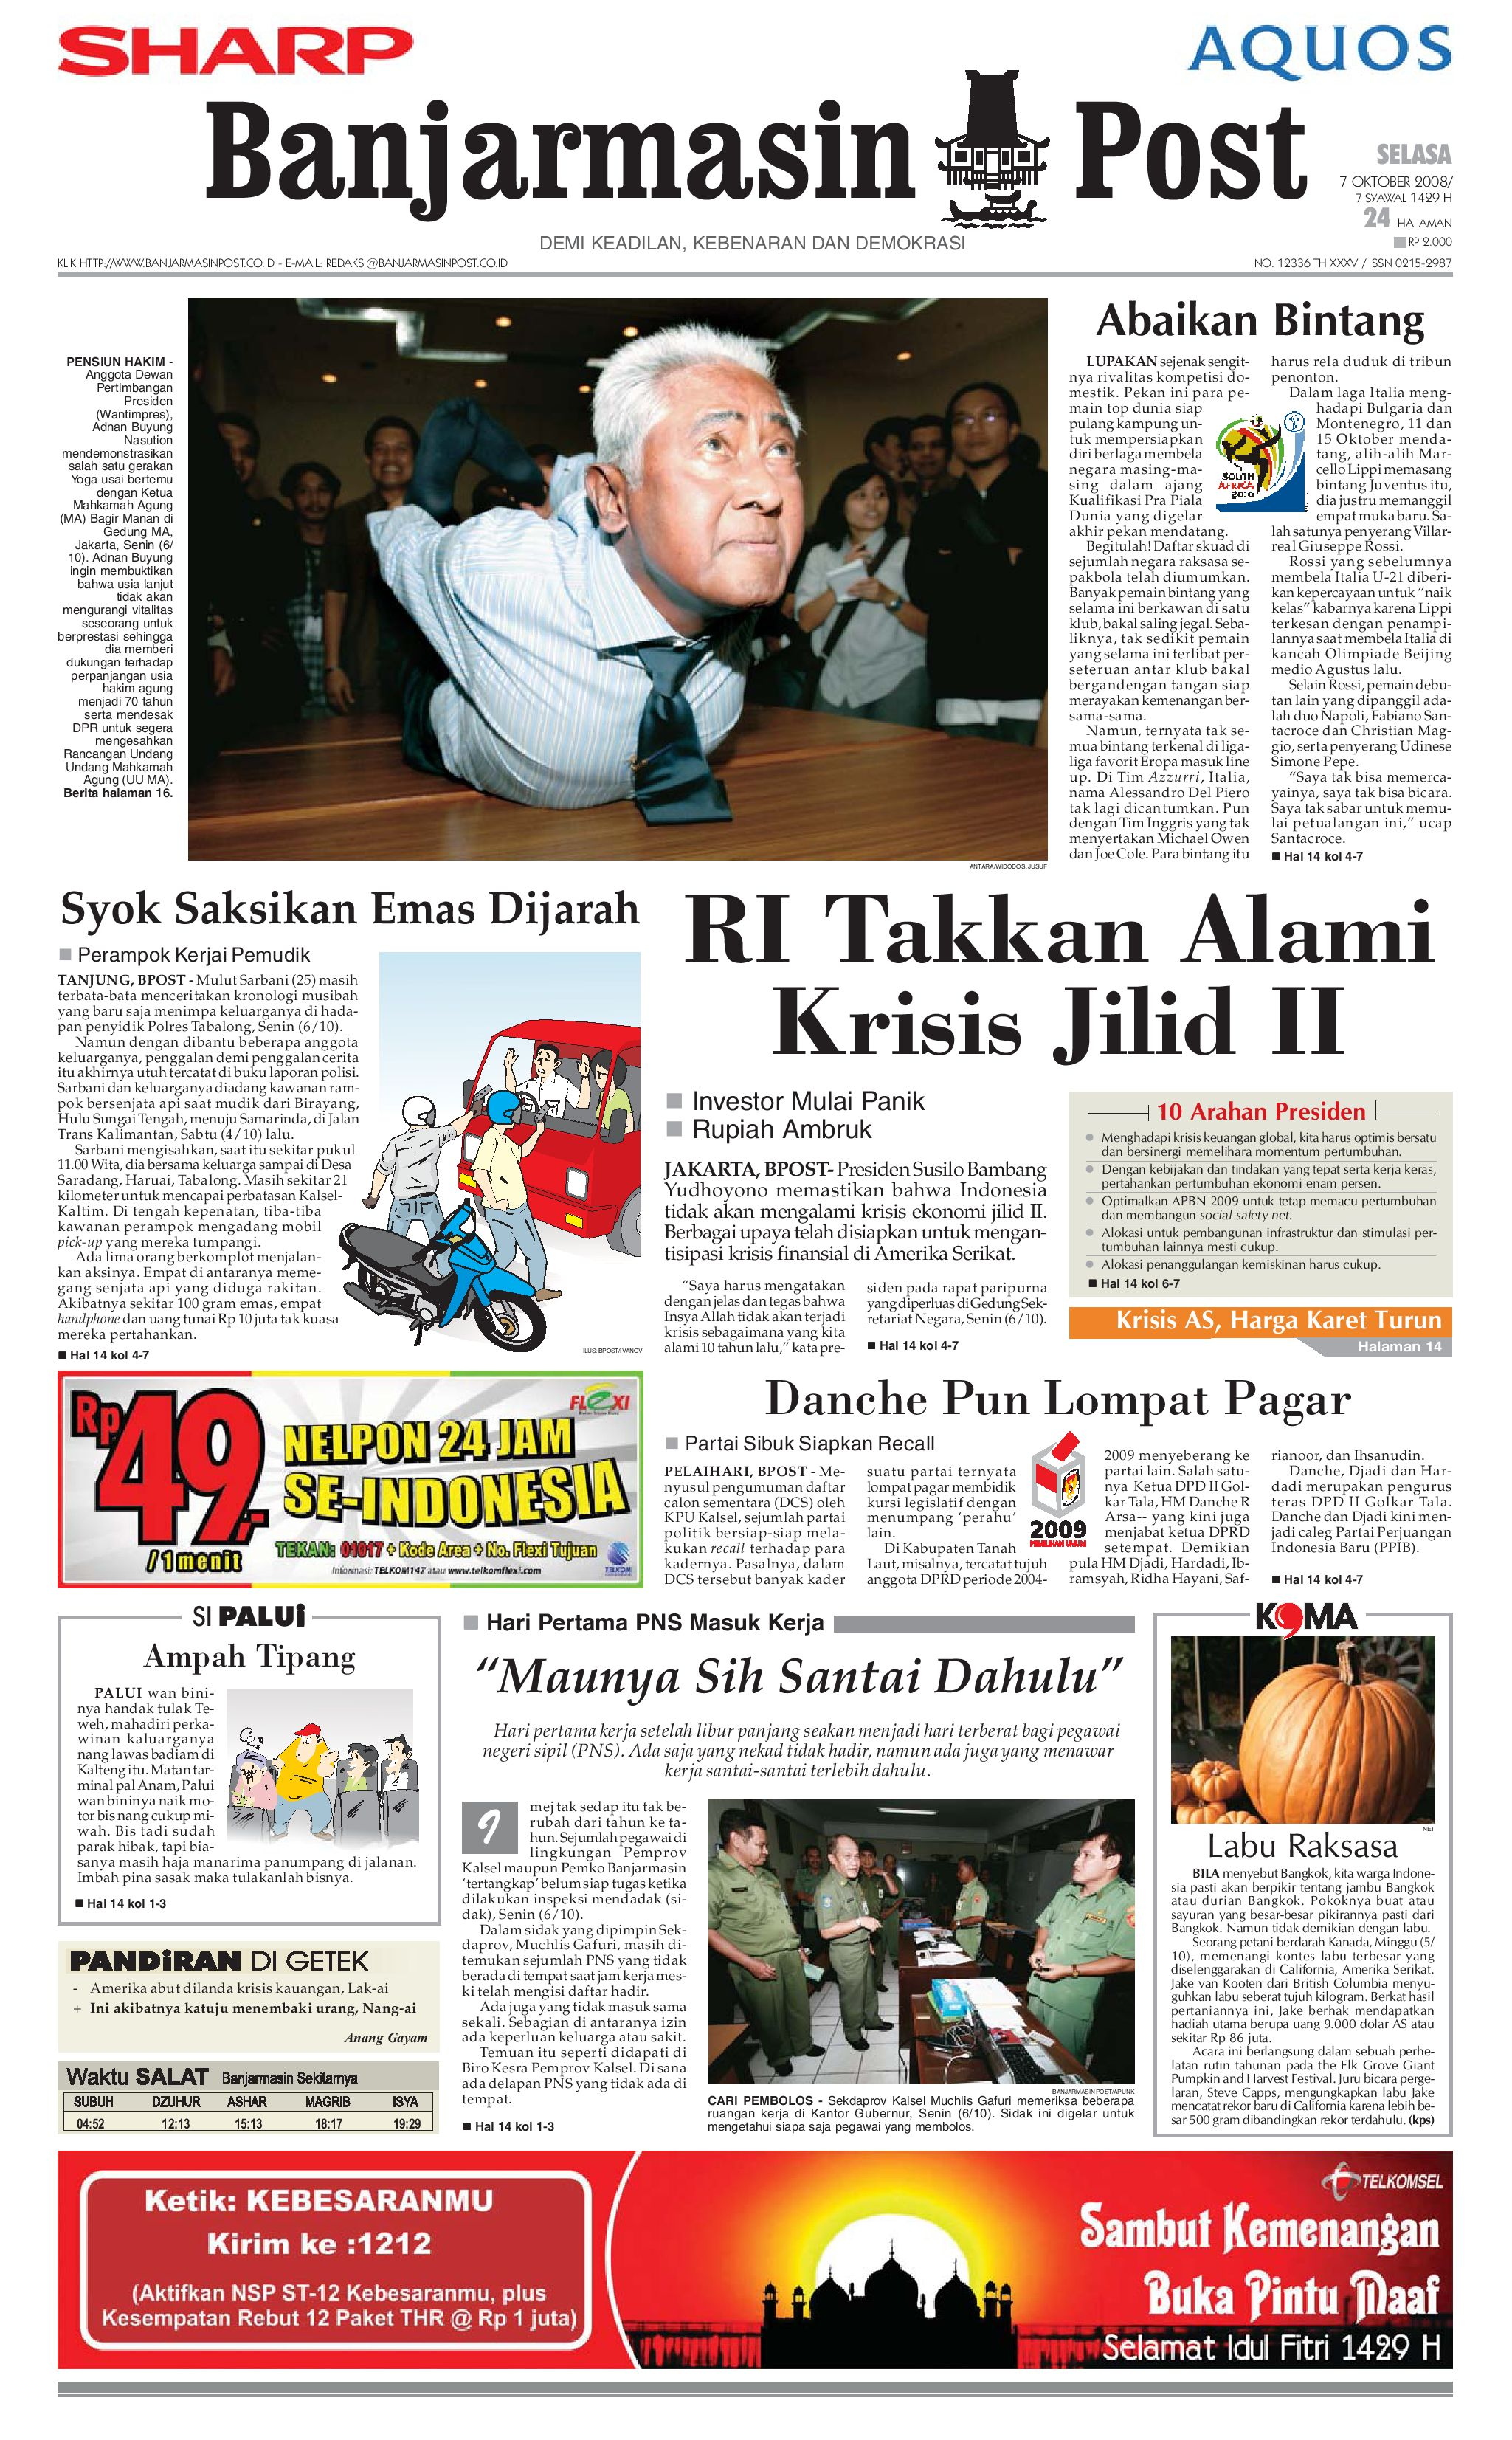 Banjarmasin Post 7 Oktober 2008 By Issuu Produk Ukm Bumn Jus Durian Lite Kuning Omah Duren